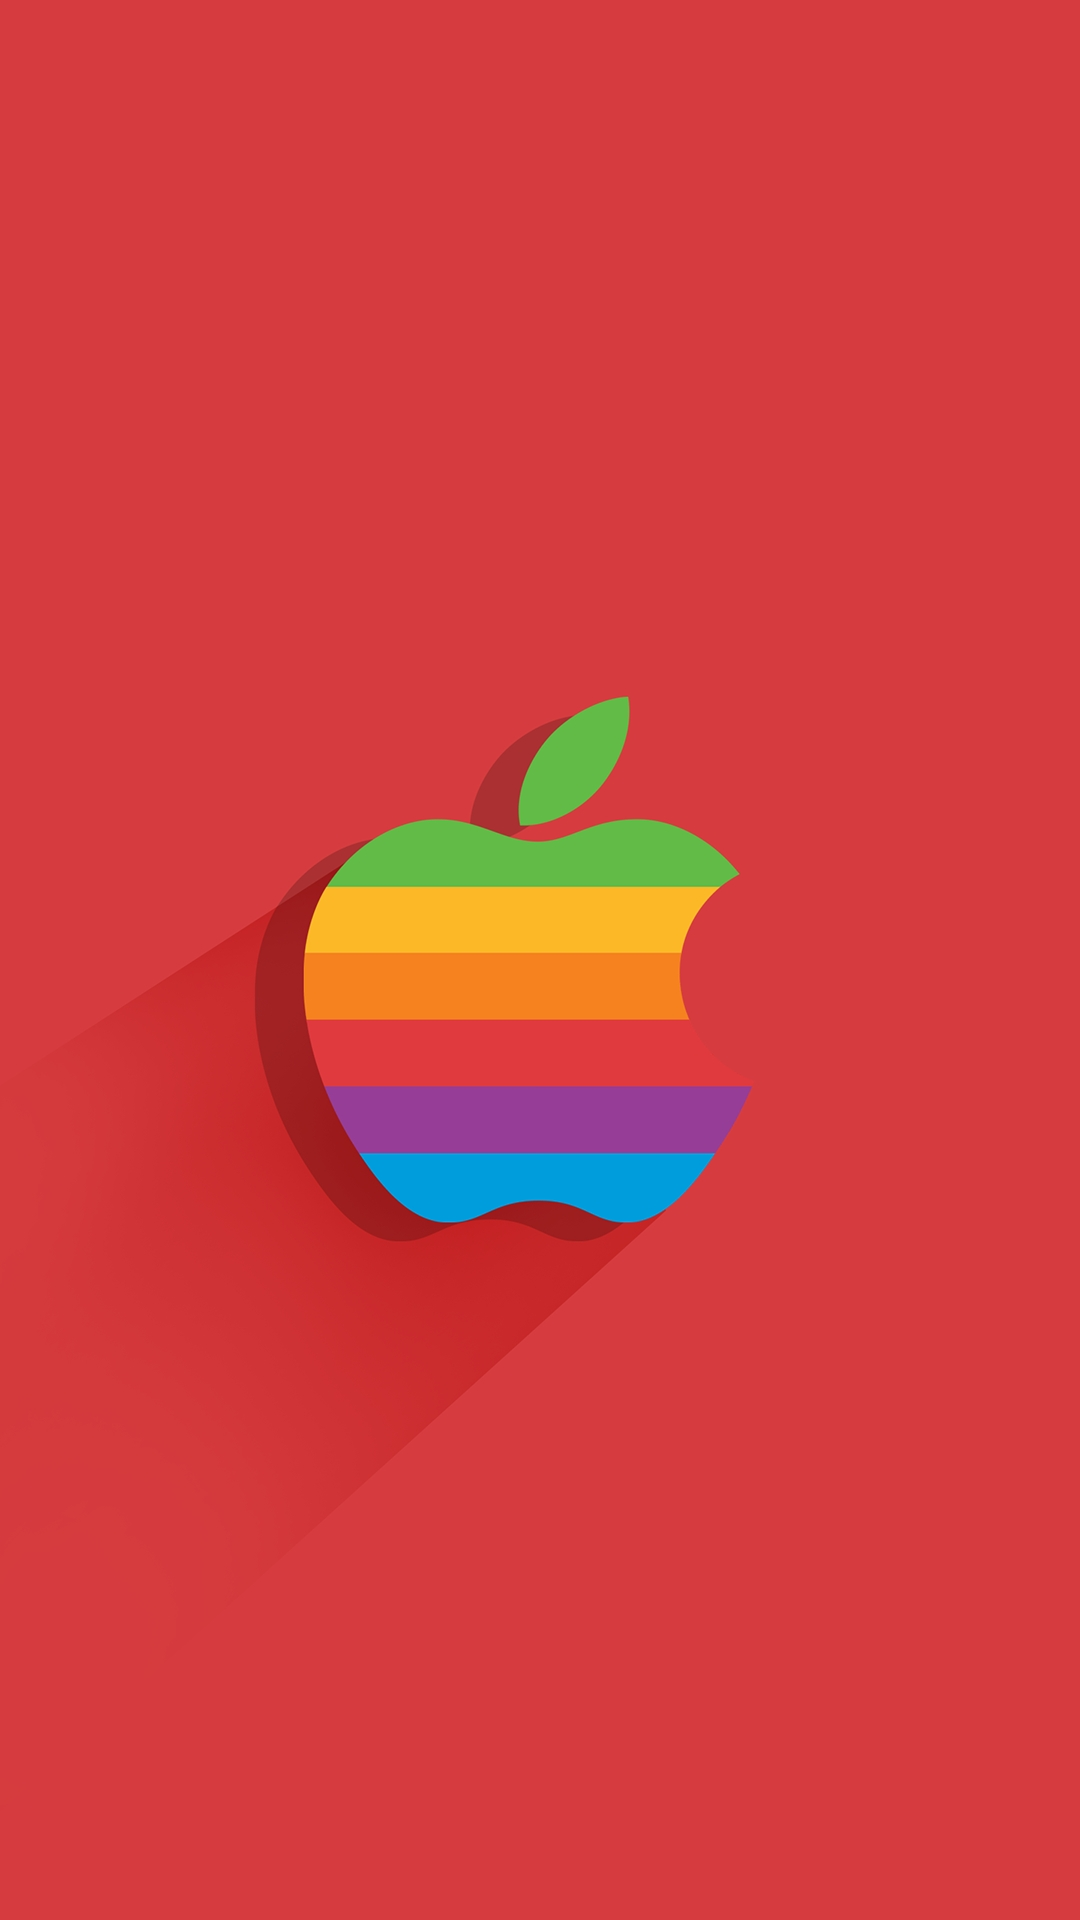 apple_logo_wallpaper_iphone_6s_plus_by_lirking20-d9zru2i 1,080